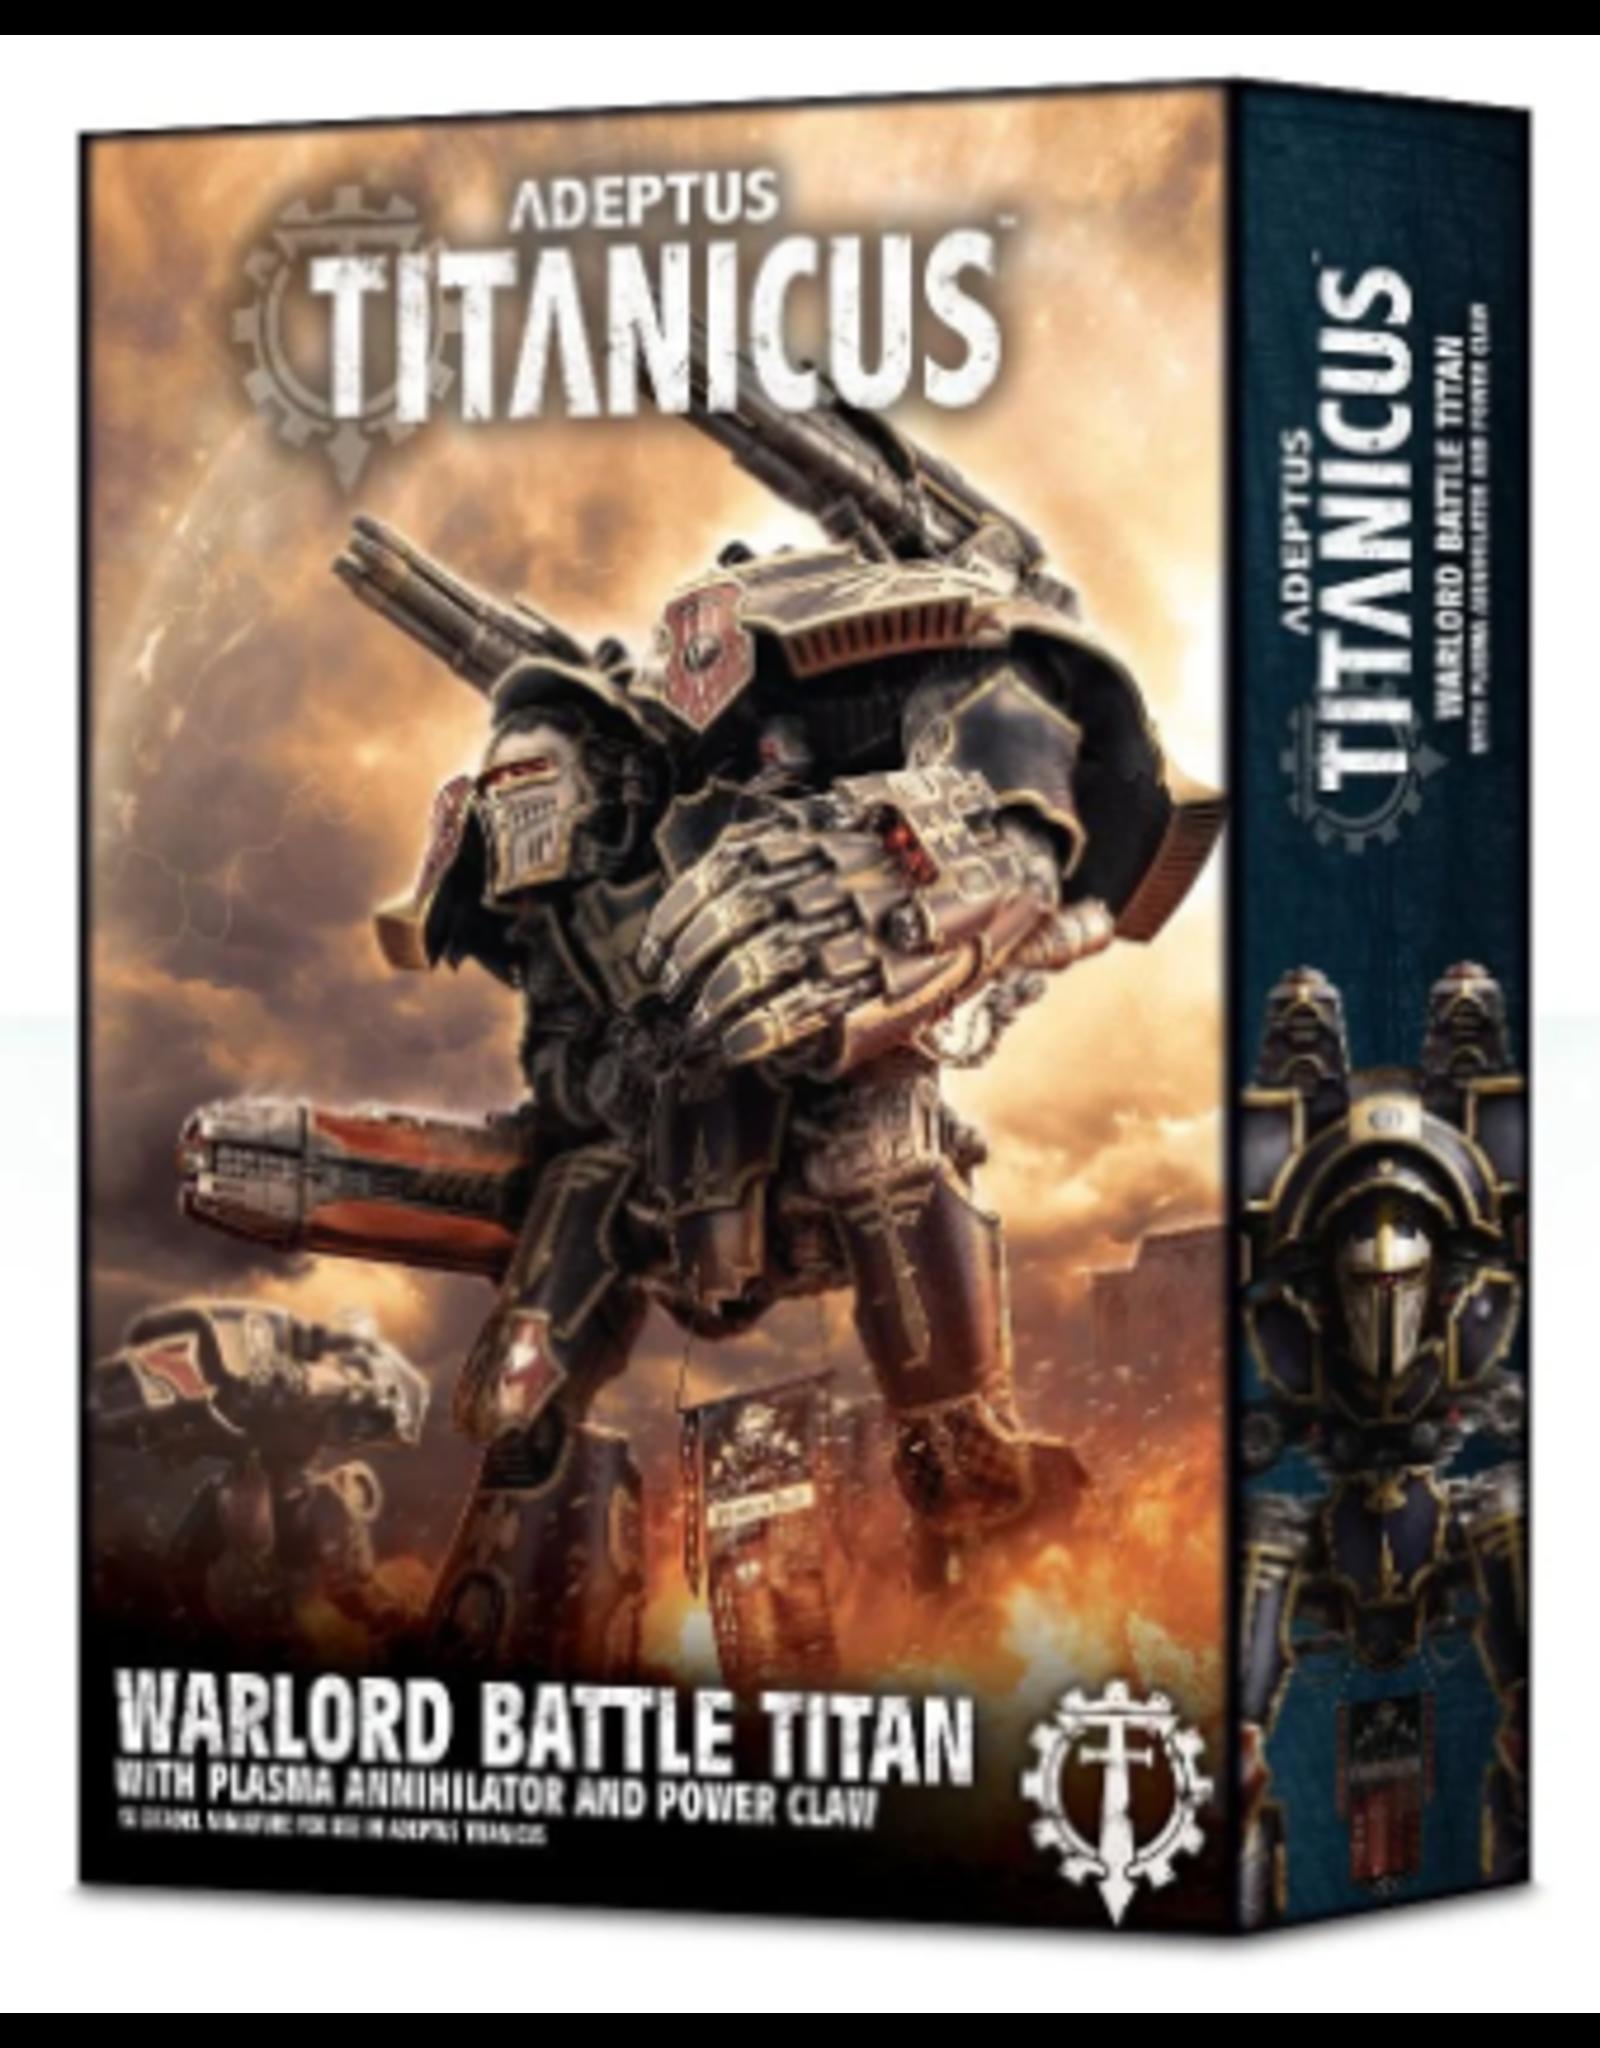 Games Workshop ADEPTUS TITANICUS Warlord Titan with Plasma Annihilator